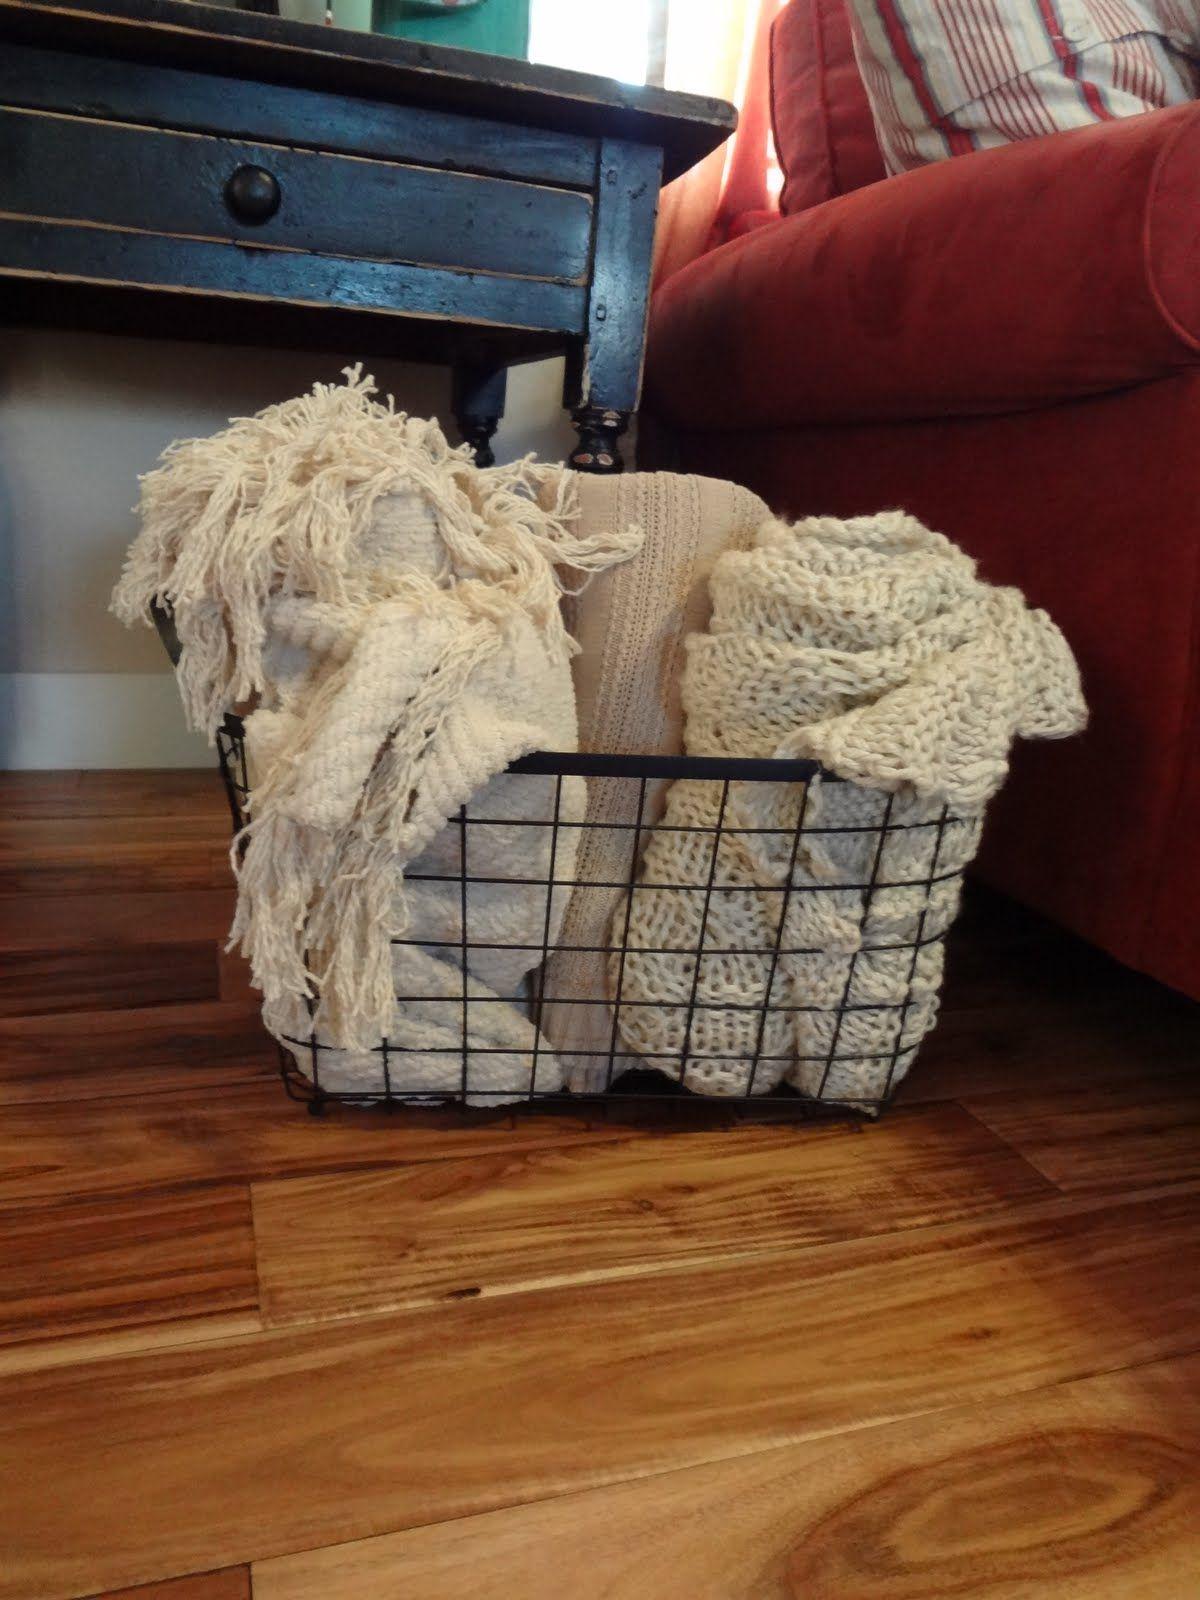 wire throw basket - living room | Home decor baskets ...